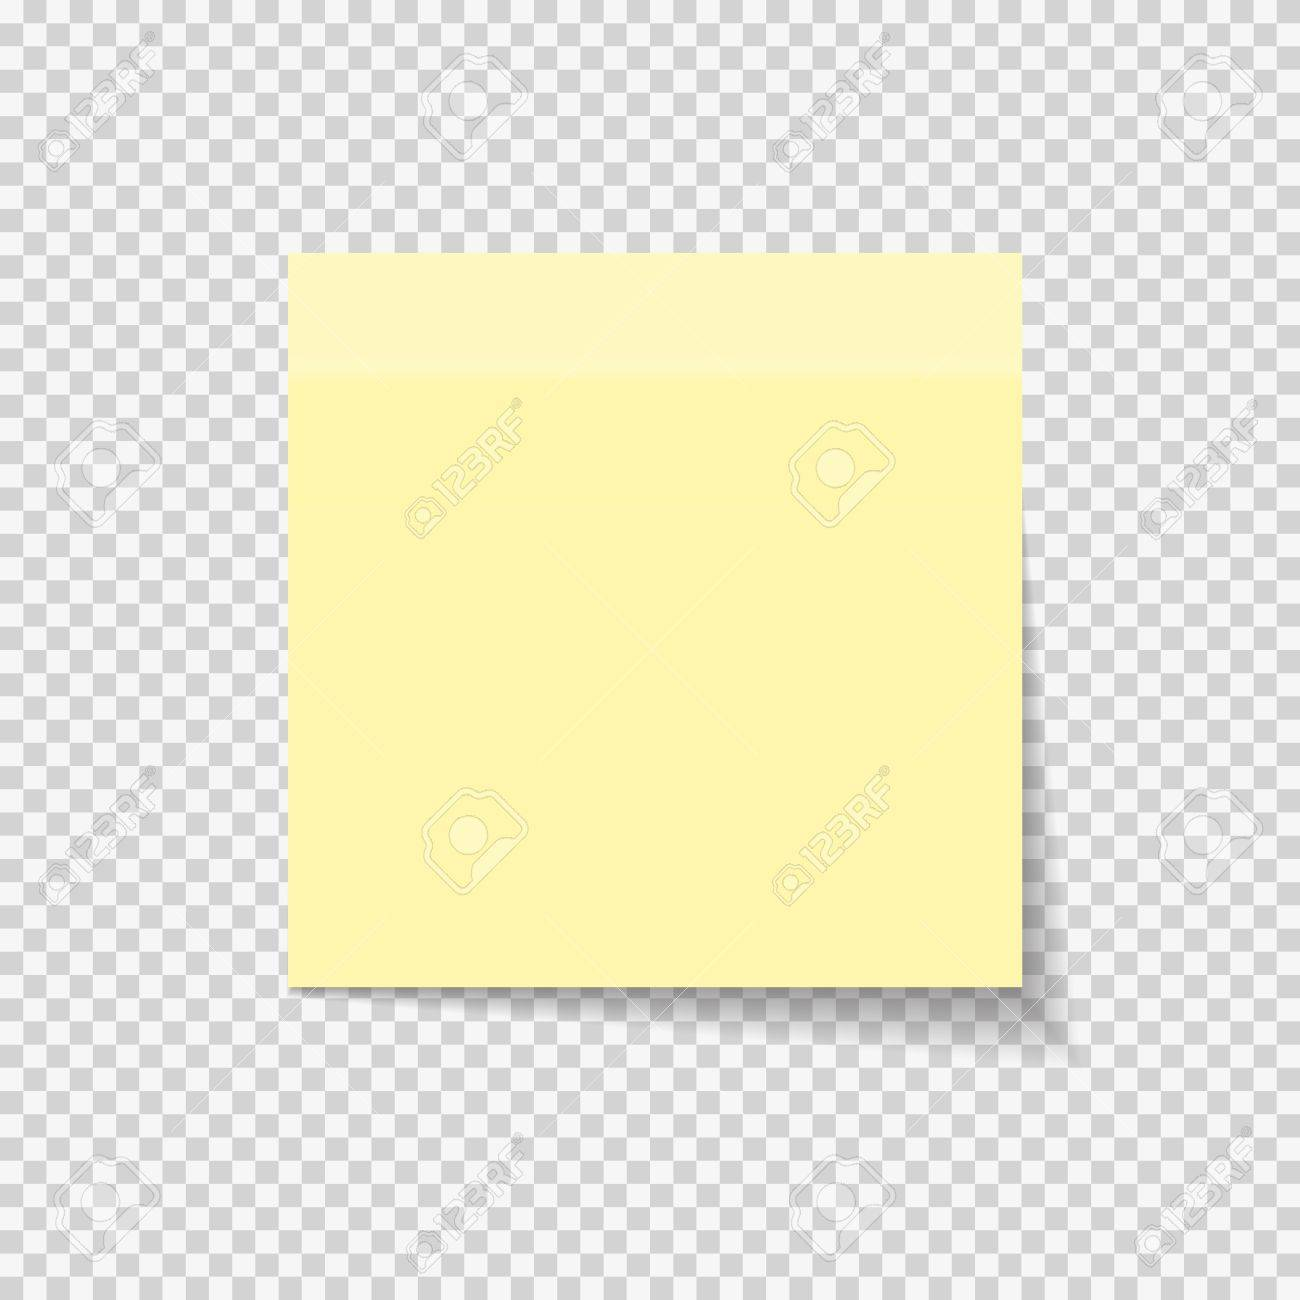 Sticky Paper Note on Transparent Background Vector Illustration EPS10 - 79890132